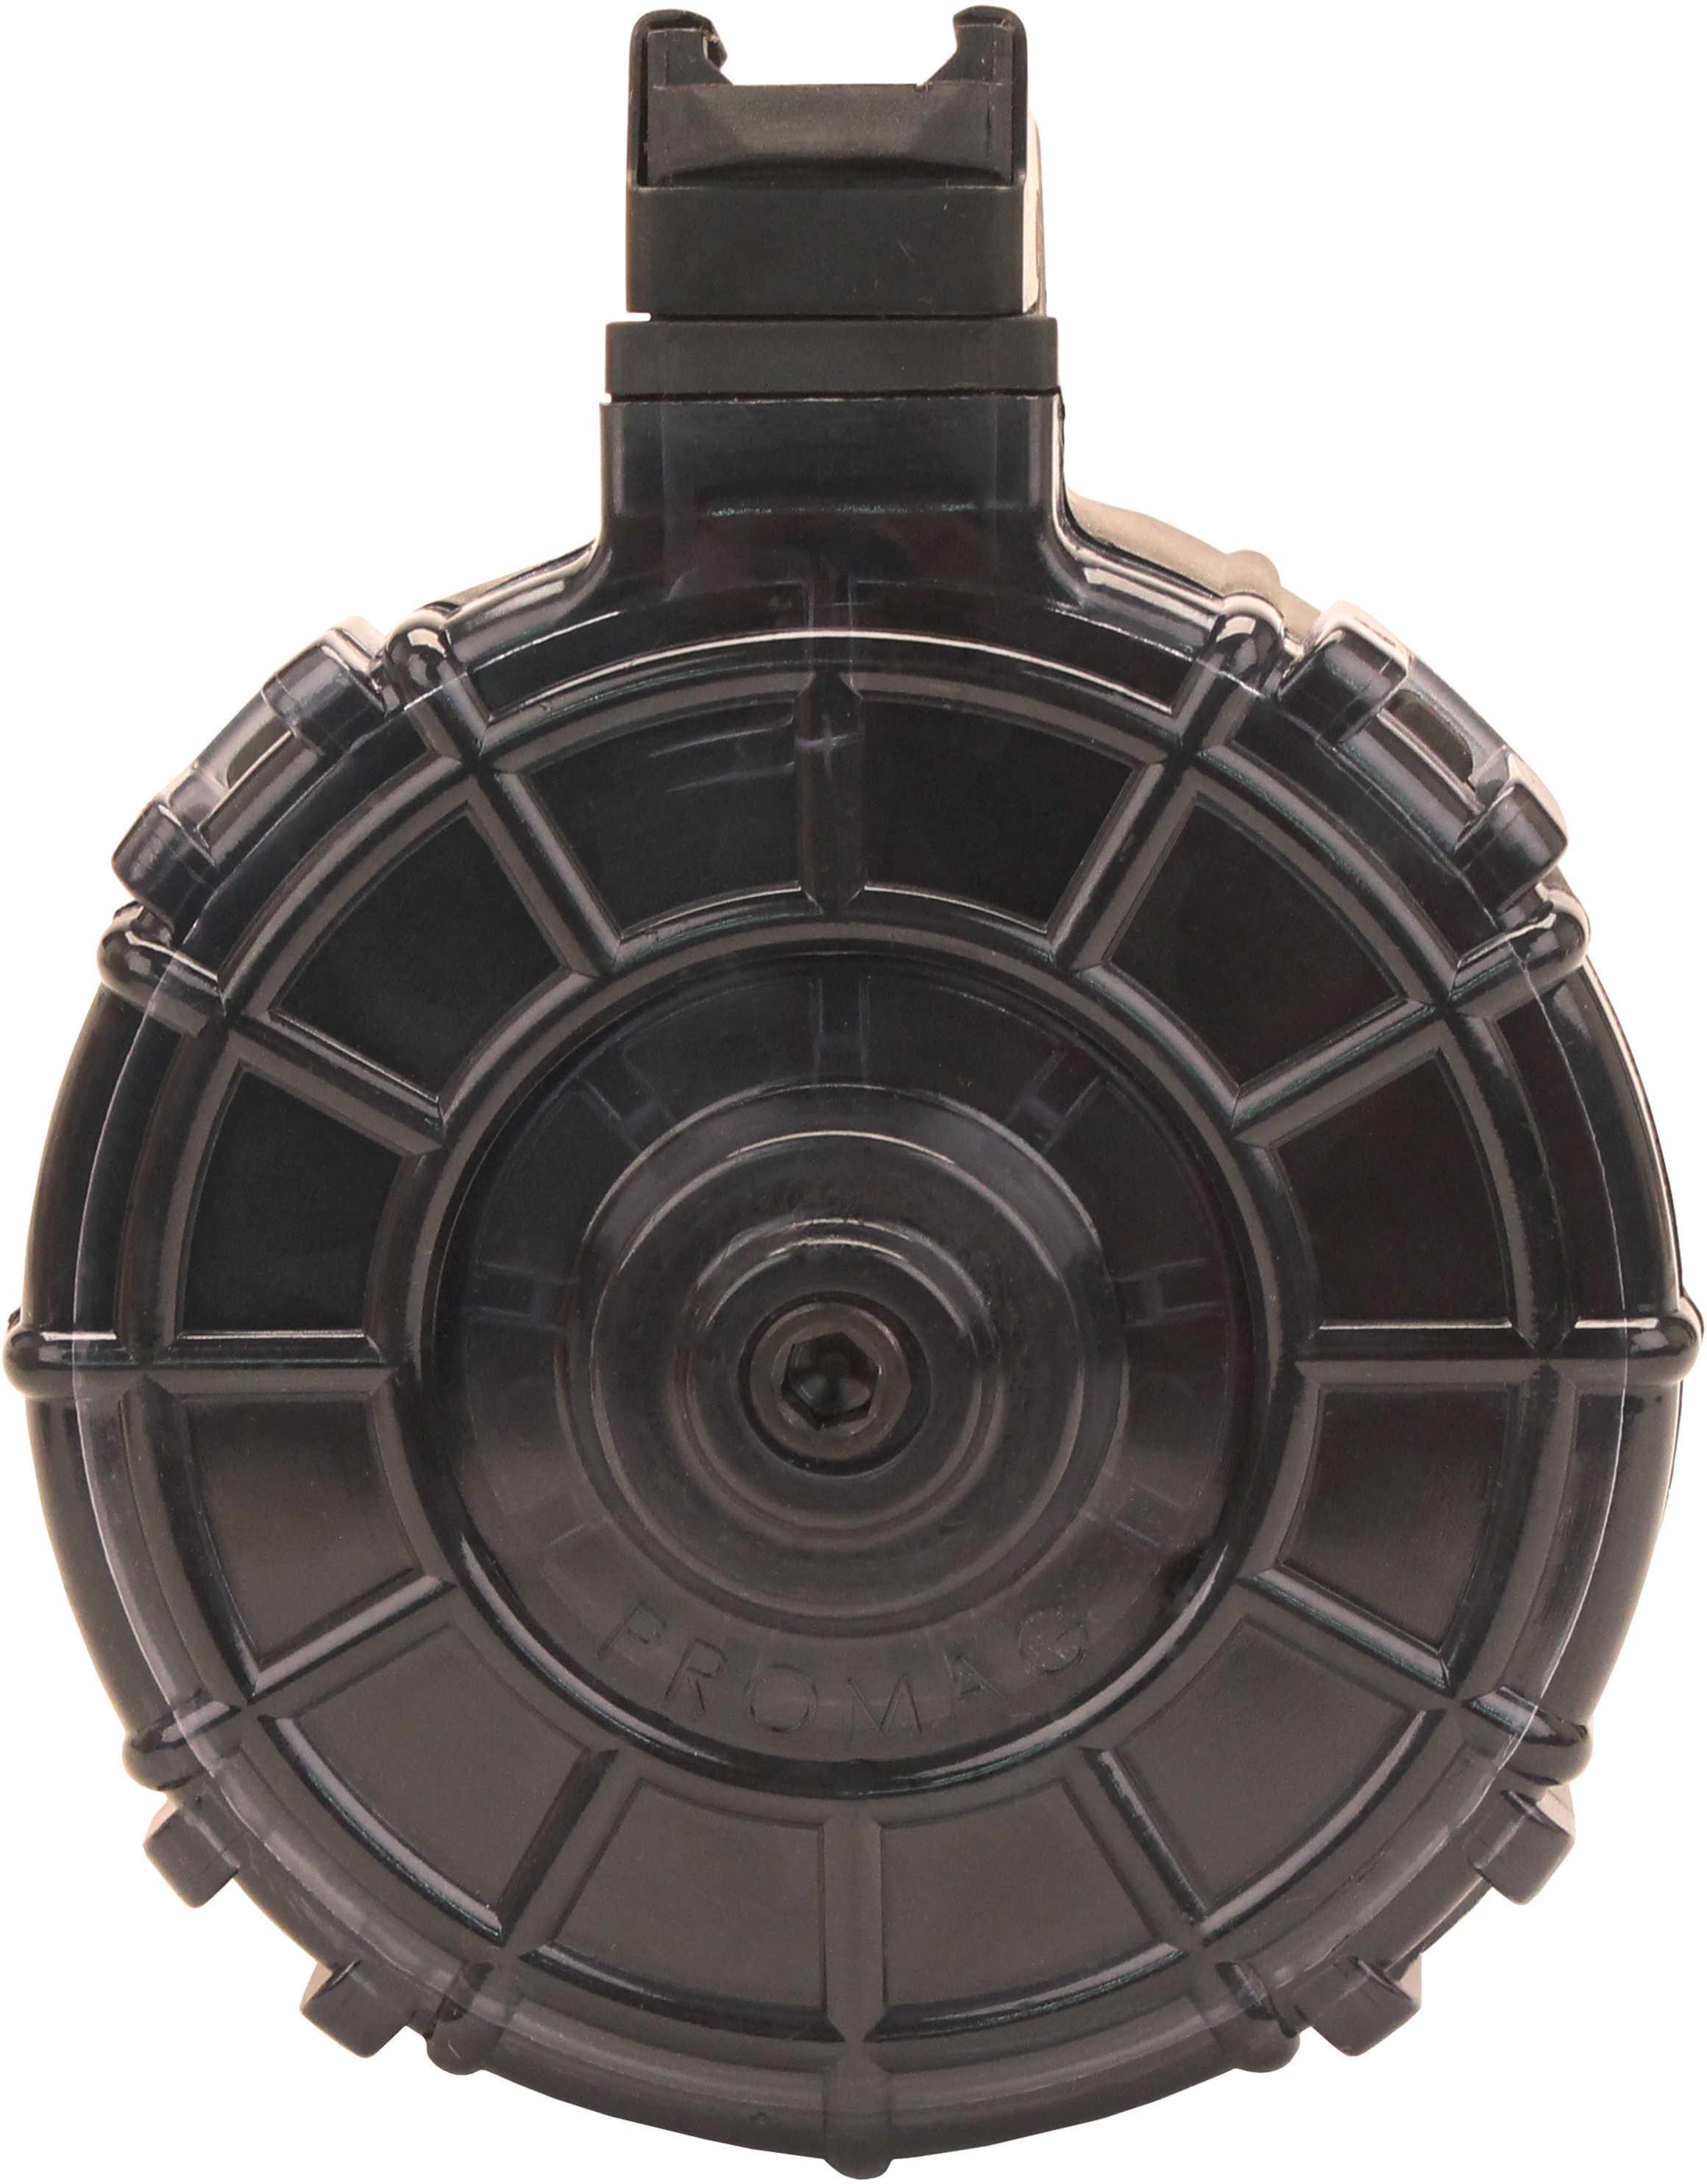 ProMag Magazine 12 Gauge 12Rd Fits Saiga Black SAI-A7